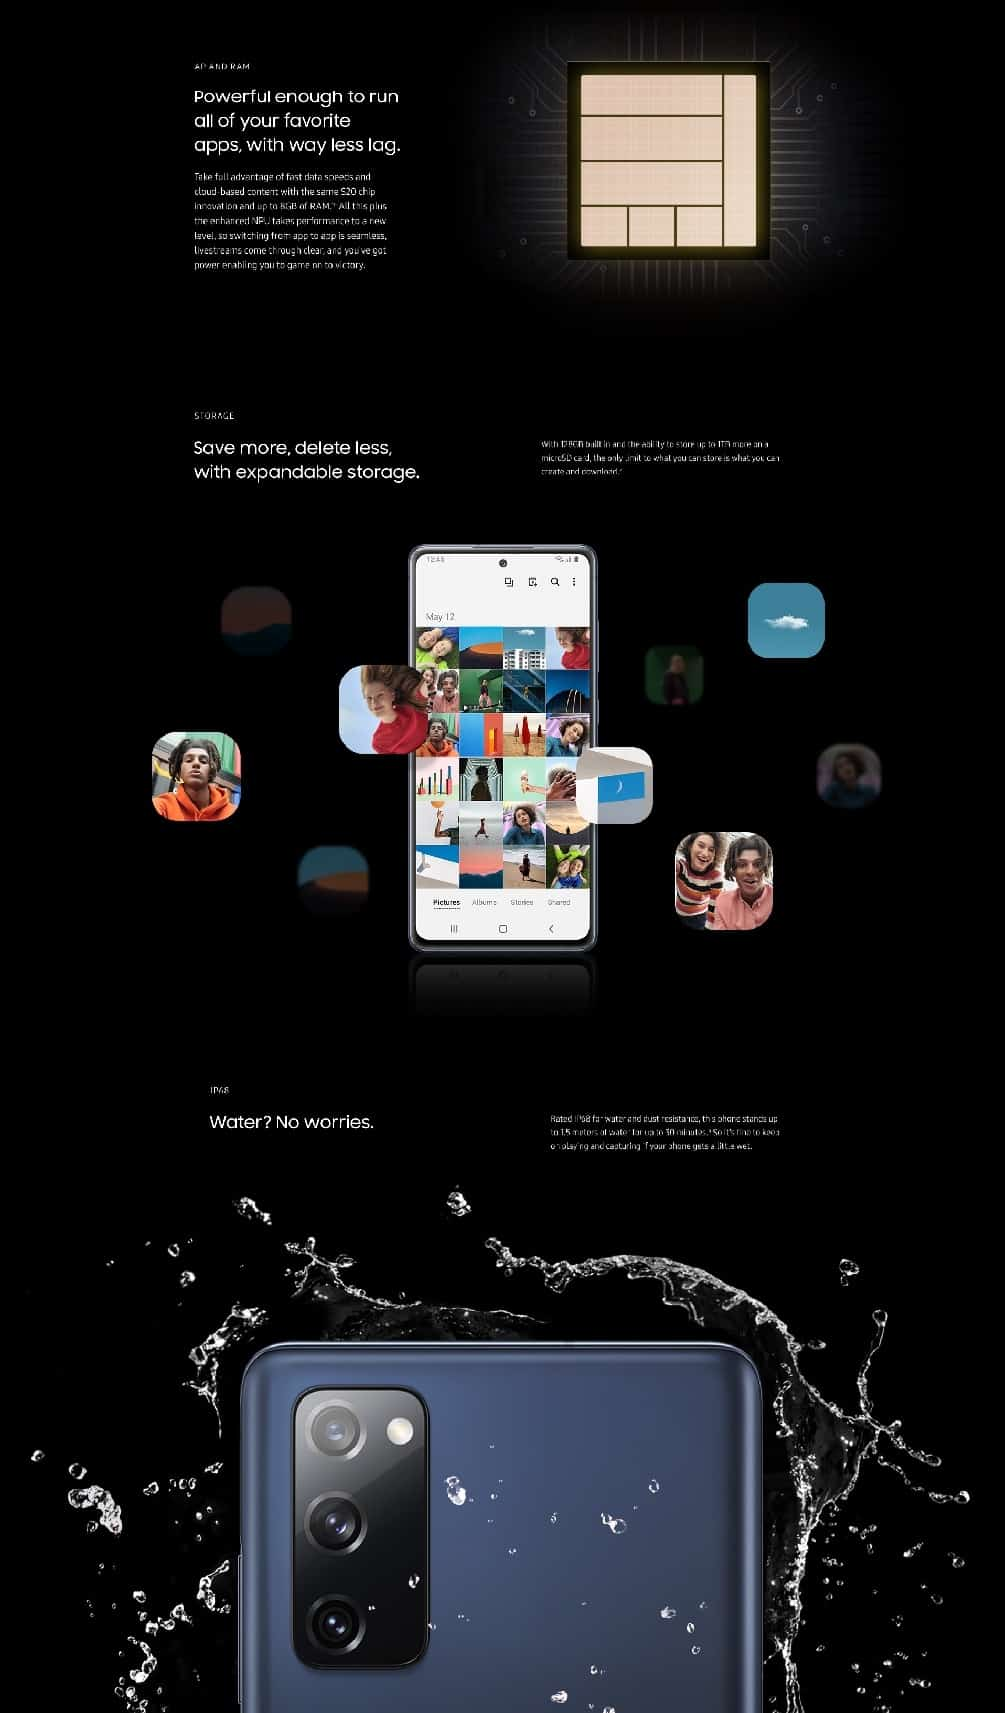 Samsung Galaxy S20 FE infographic leak 6